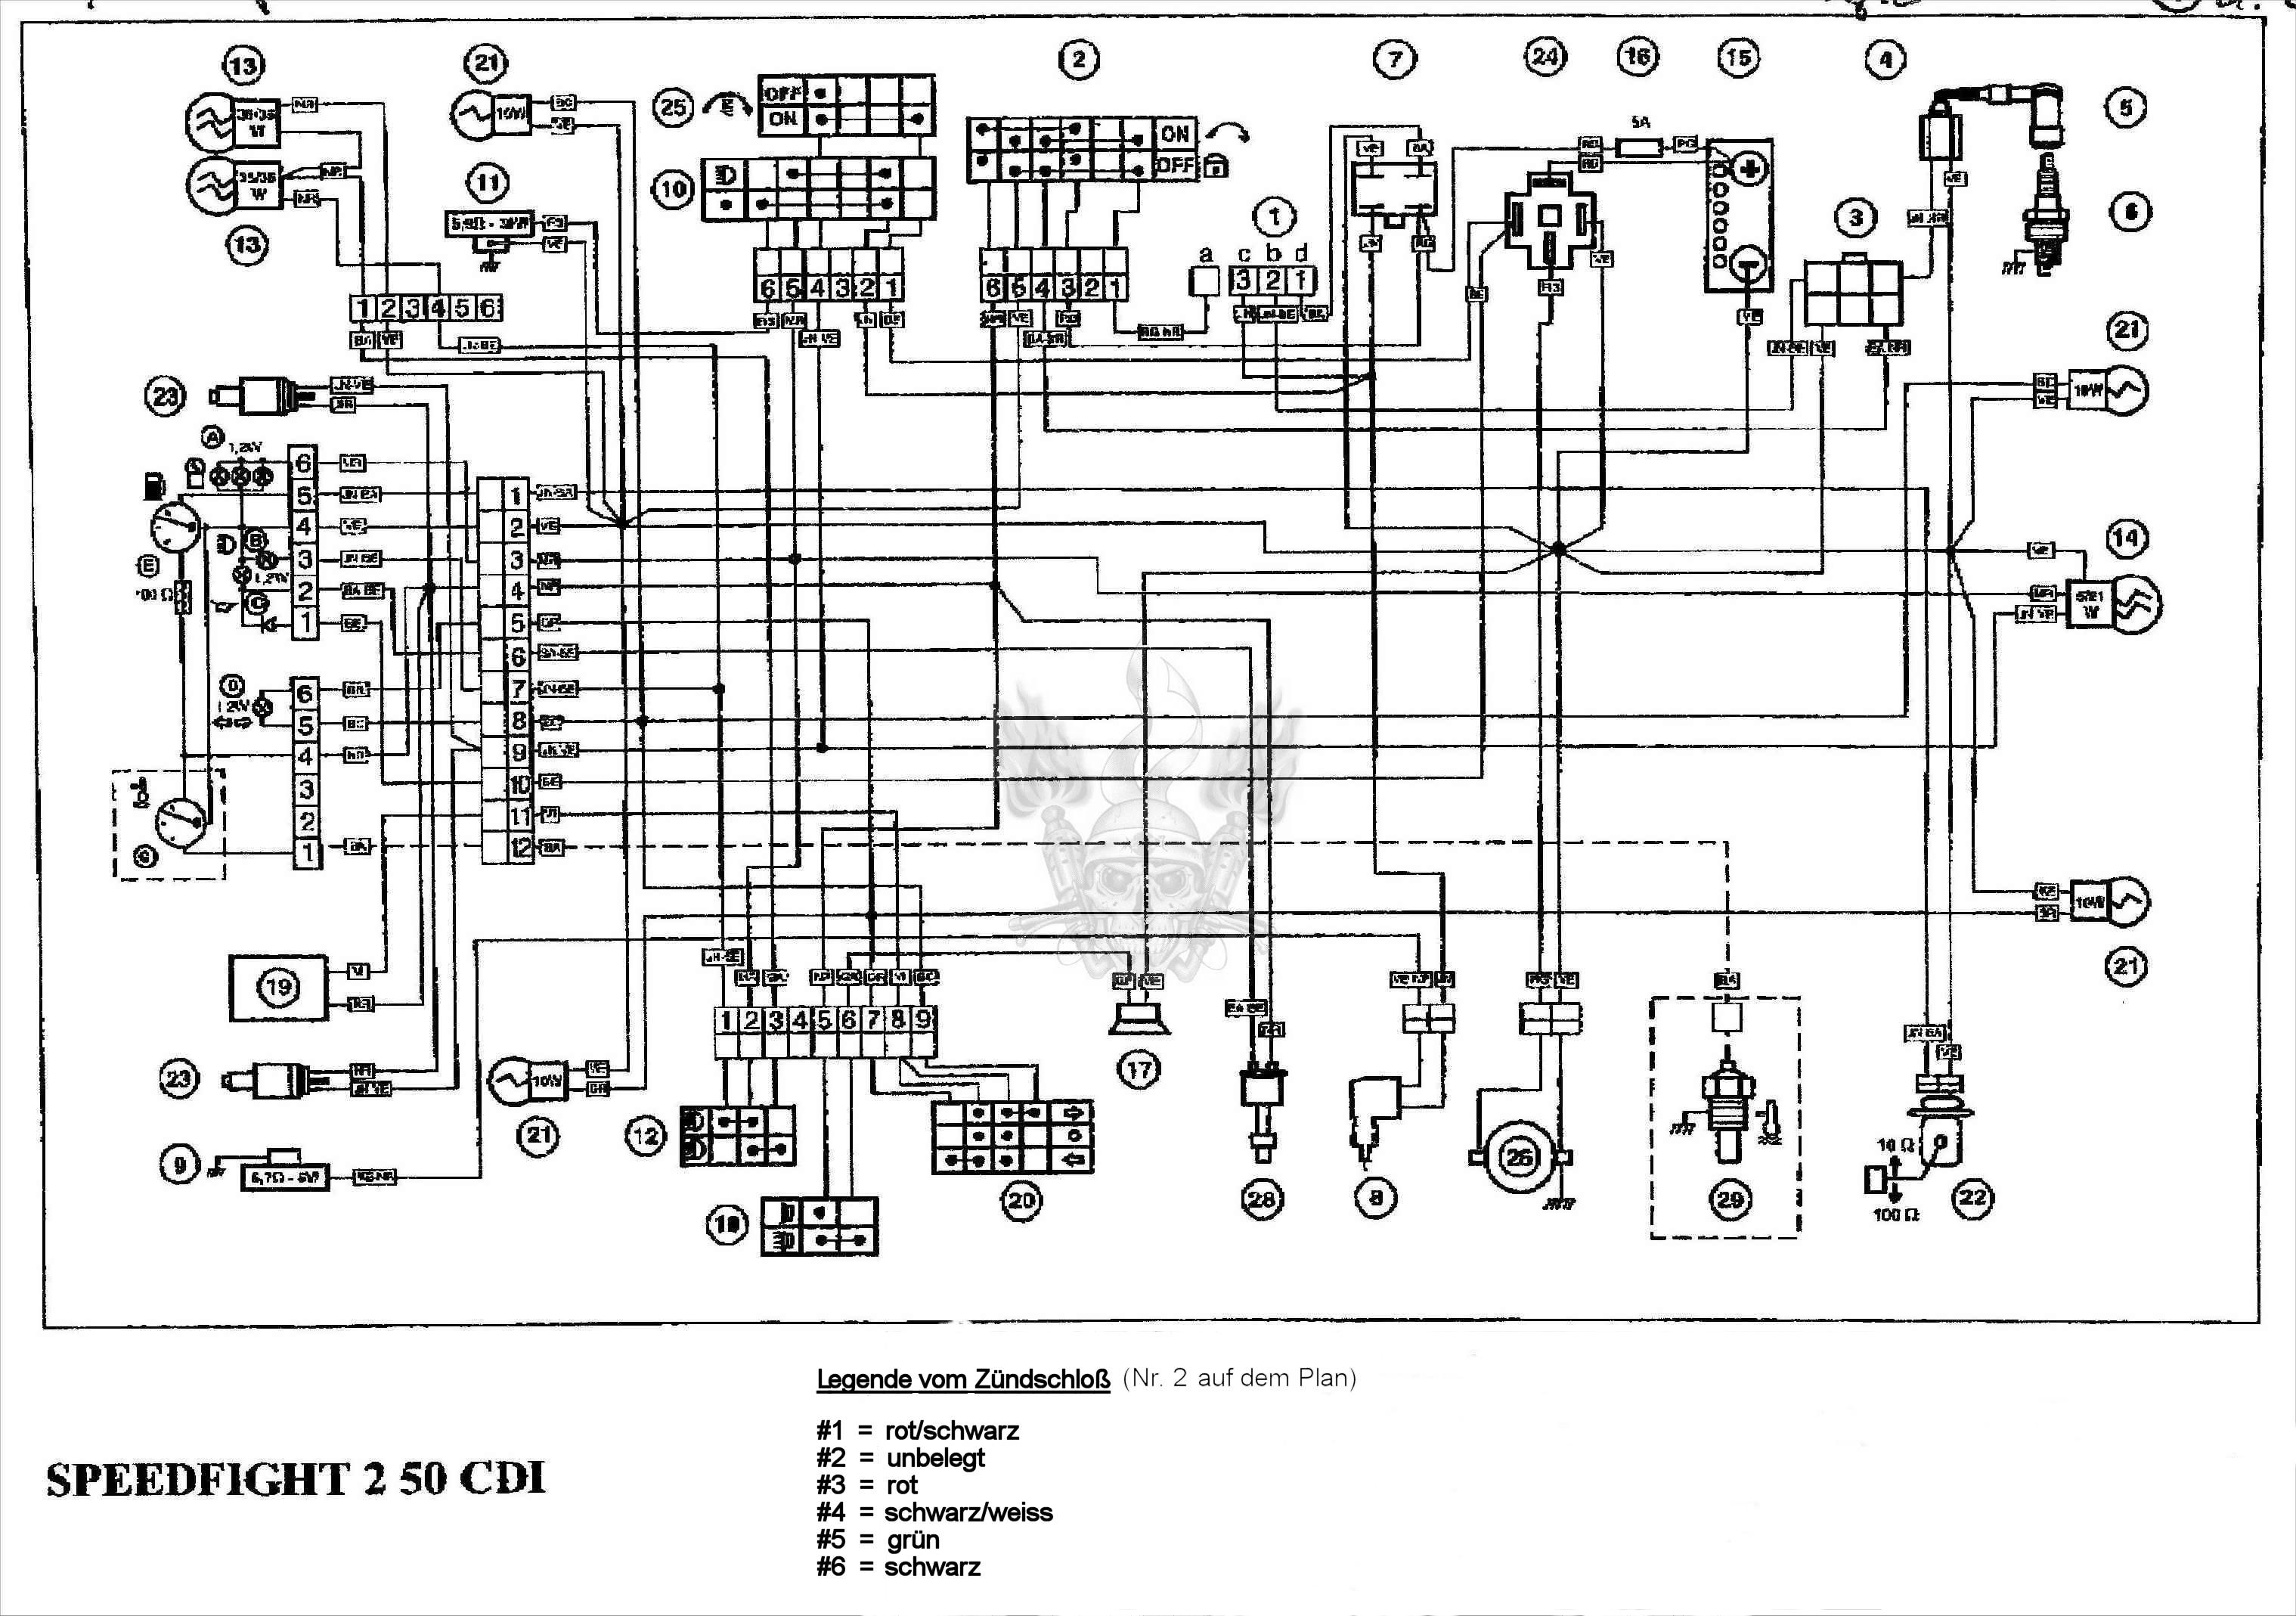 Oset Wiring Diagram. Wiring. Wiring Diagrams Instructions